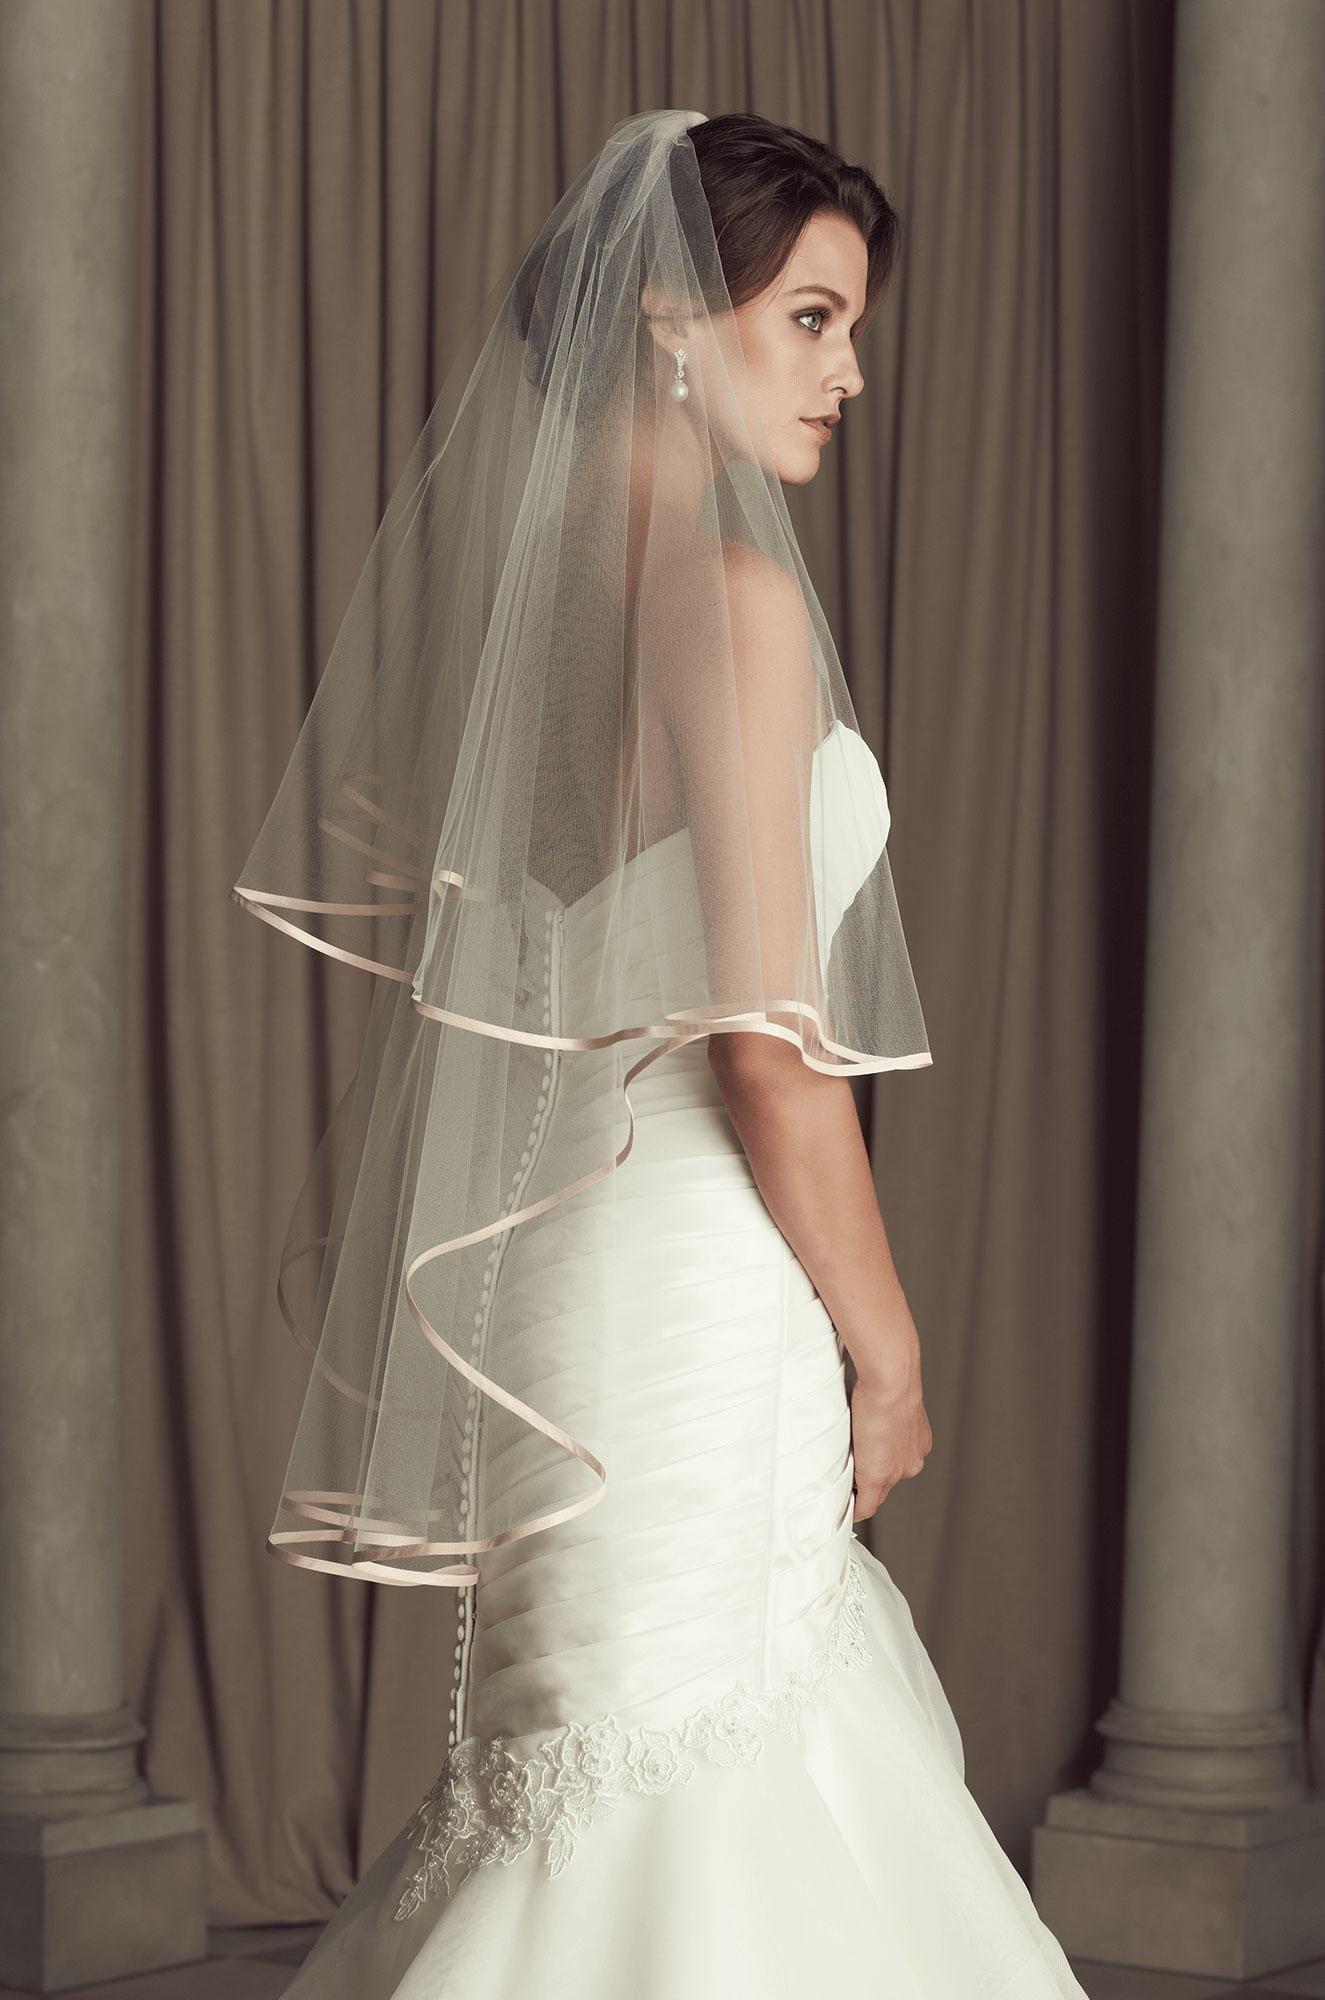 Silk Dupioni Edged Veil Style V442fd Paloma Blanca Veil Styles Wedding Bridal Veils Chapel Length Veil [ 2000 x 1325 Pixel ]